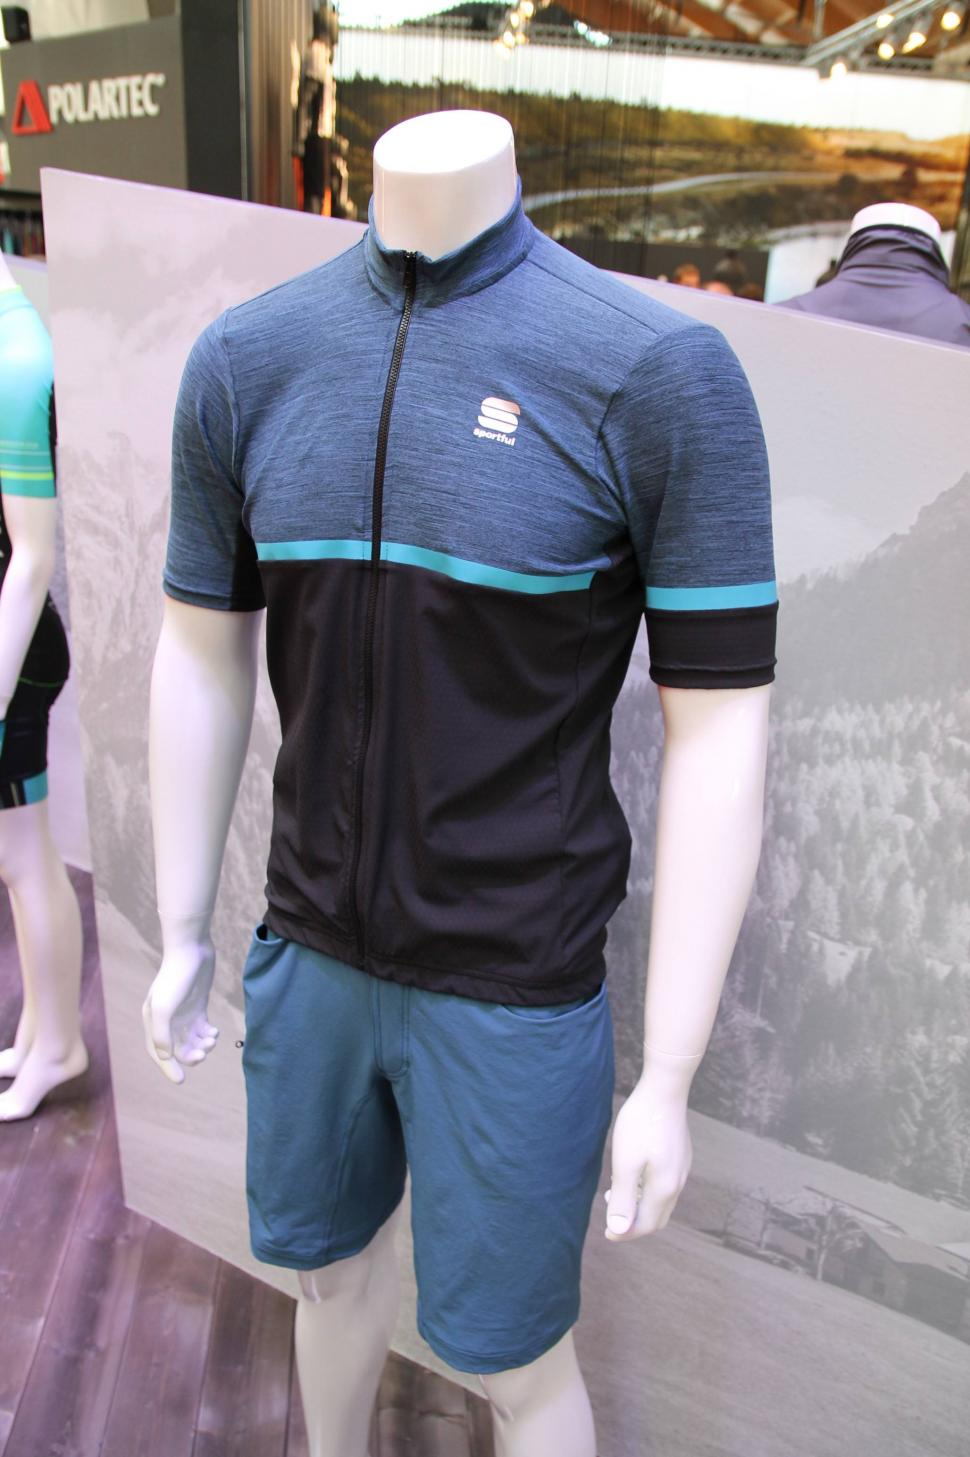 Sportful 2017 clothing - 11.jpg